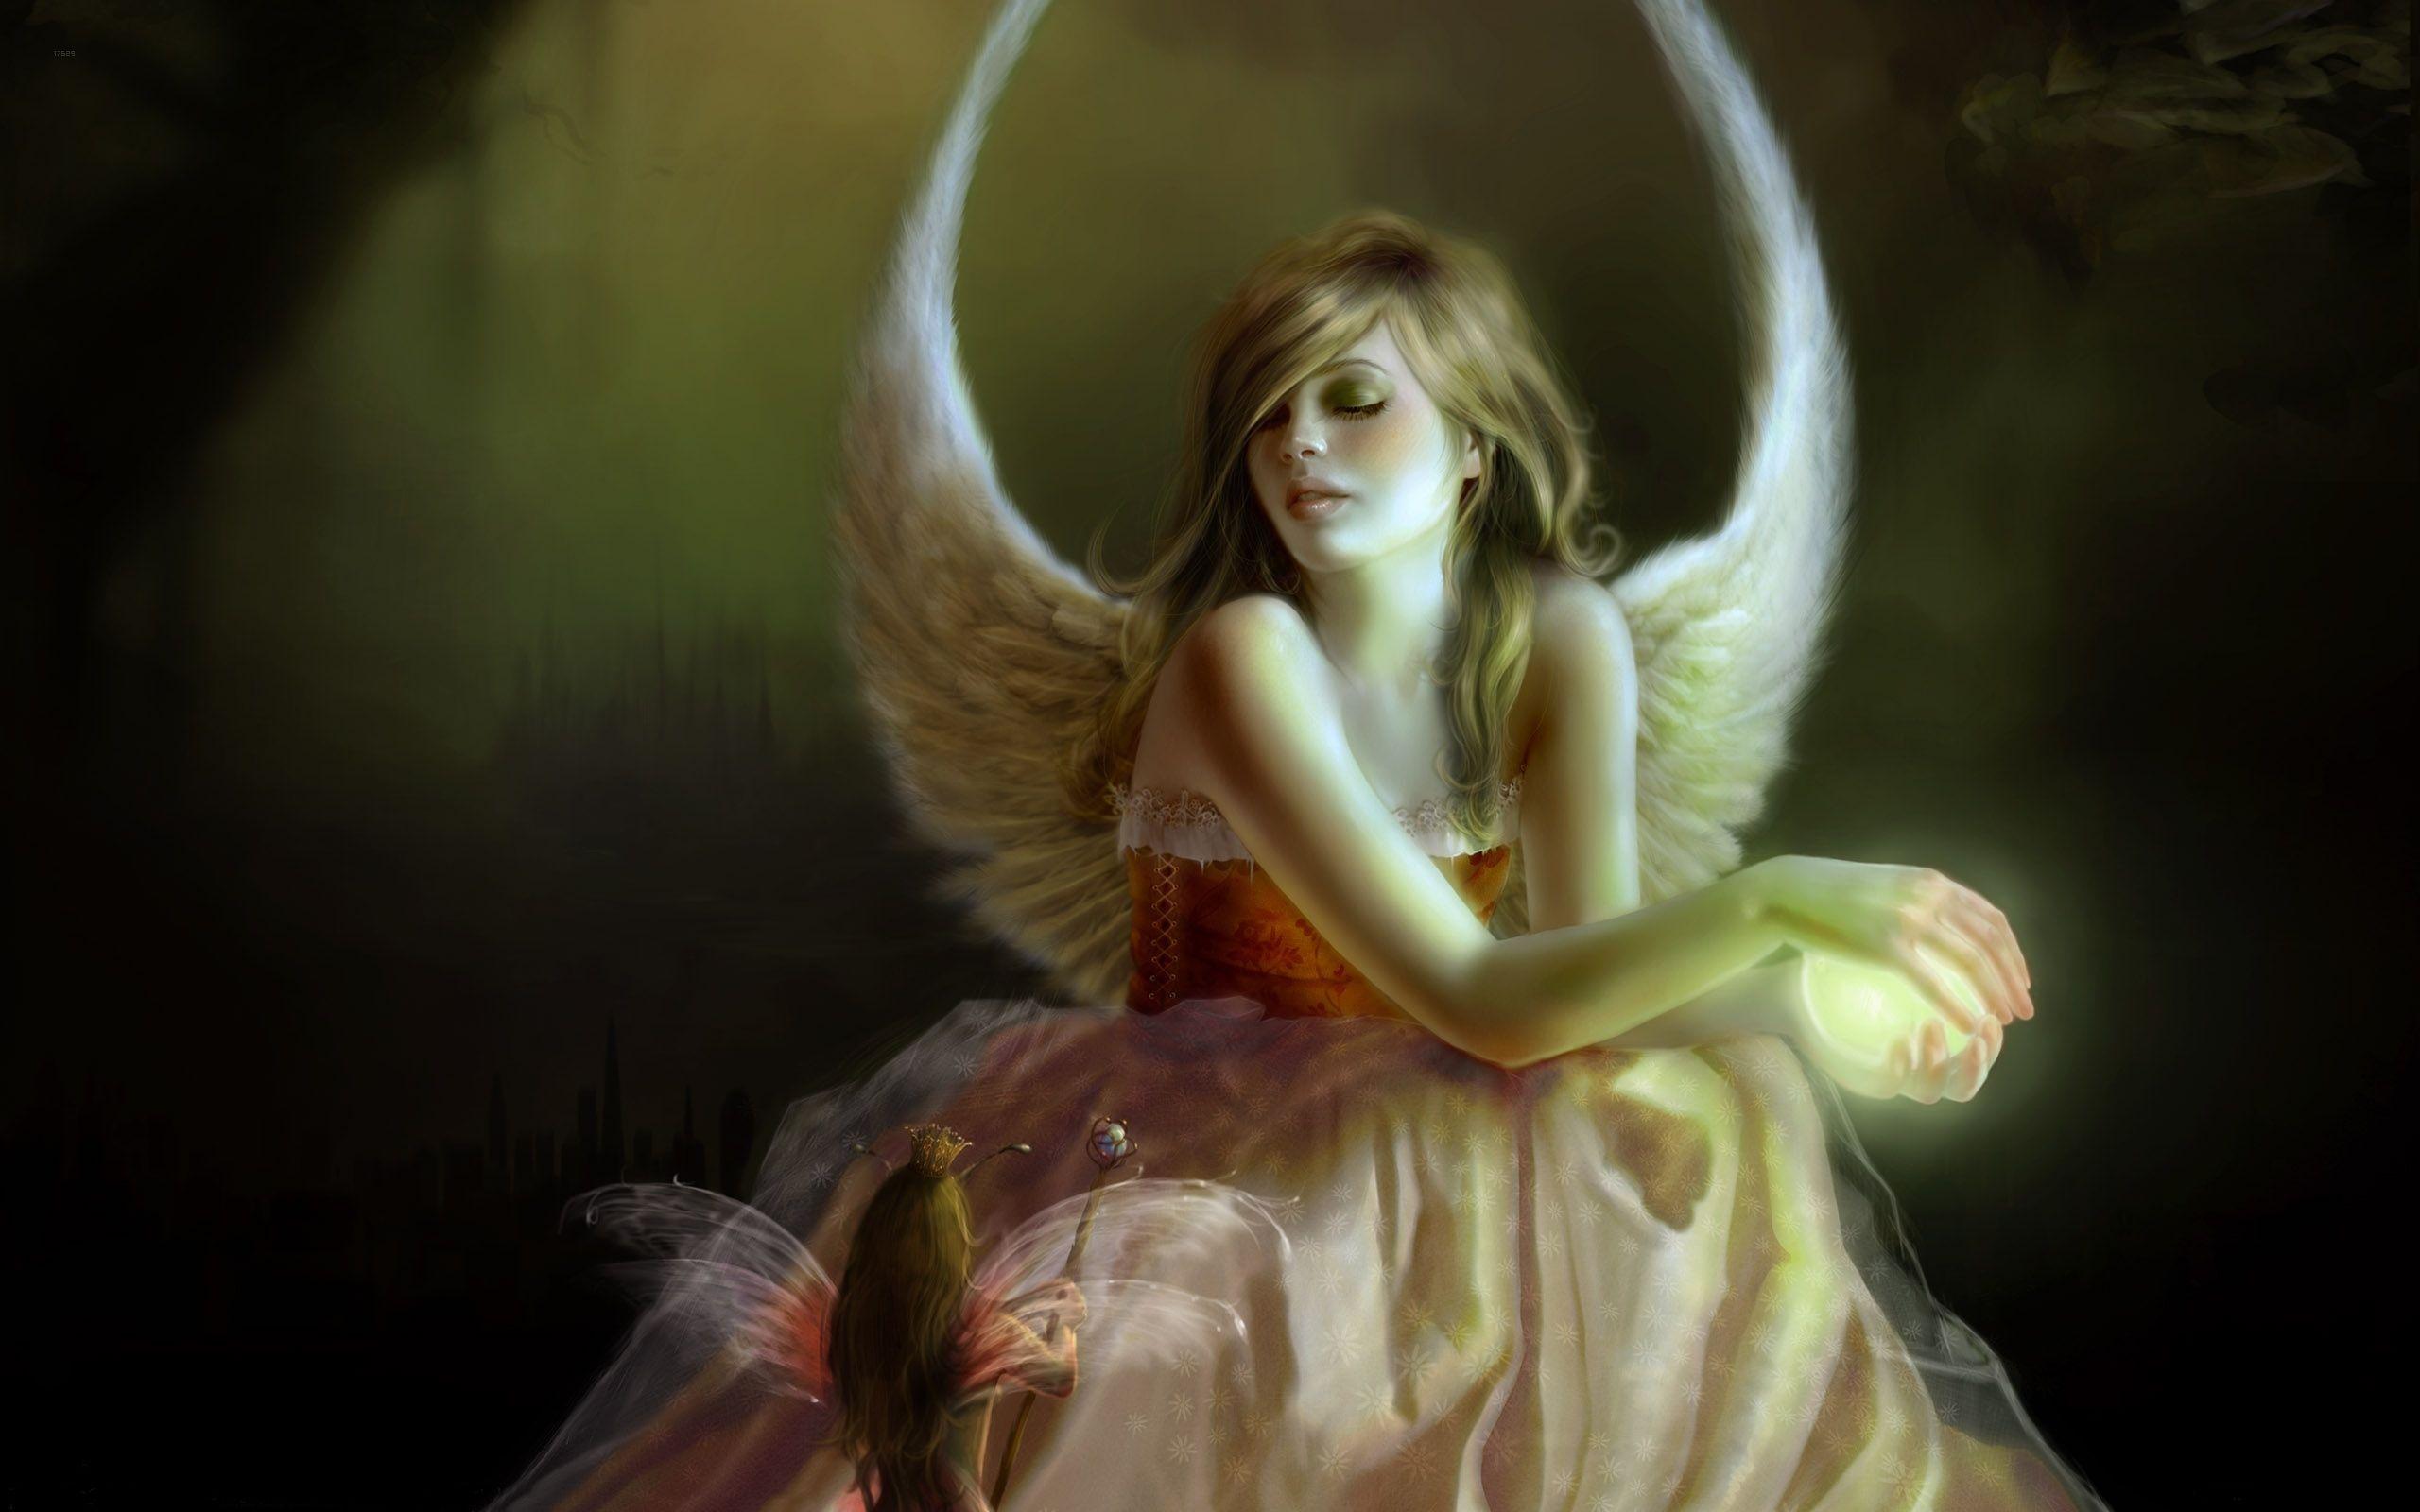 Fantastic Angels and Fairies Wallpaper